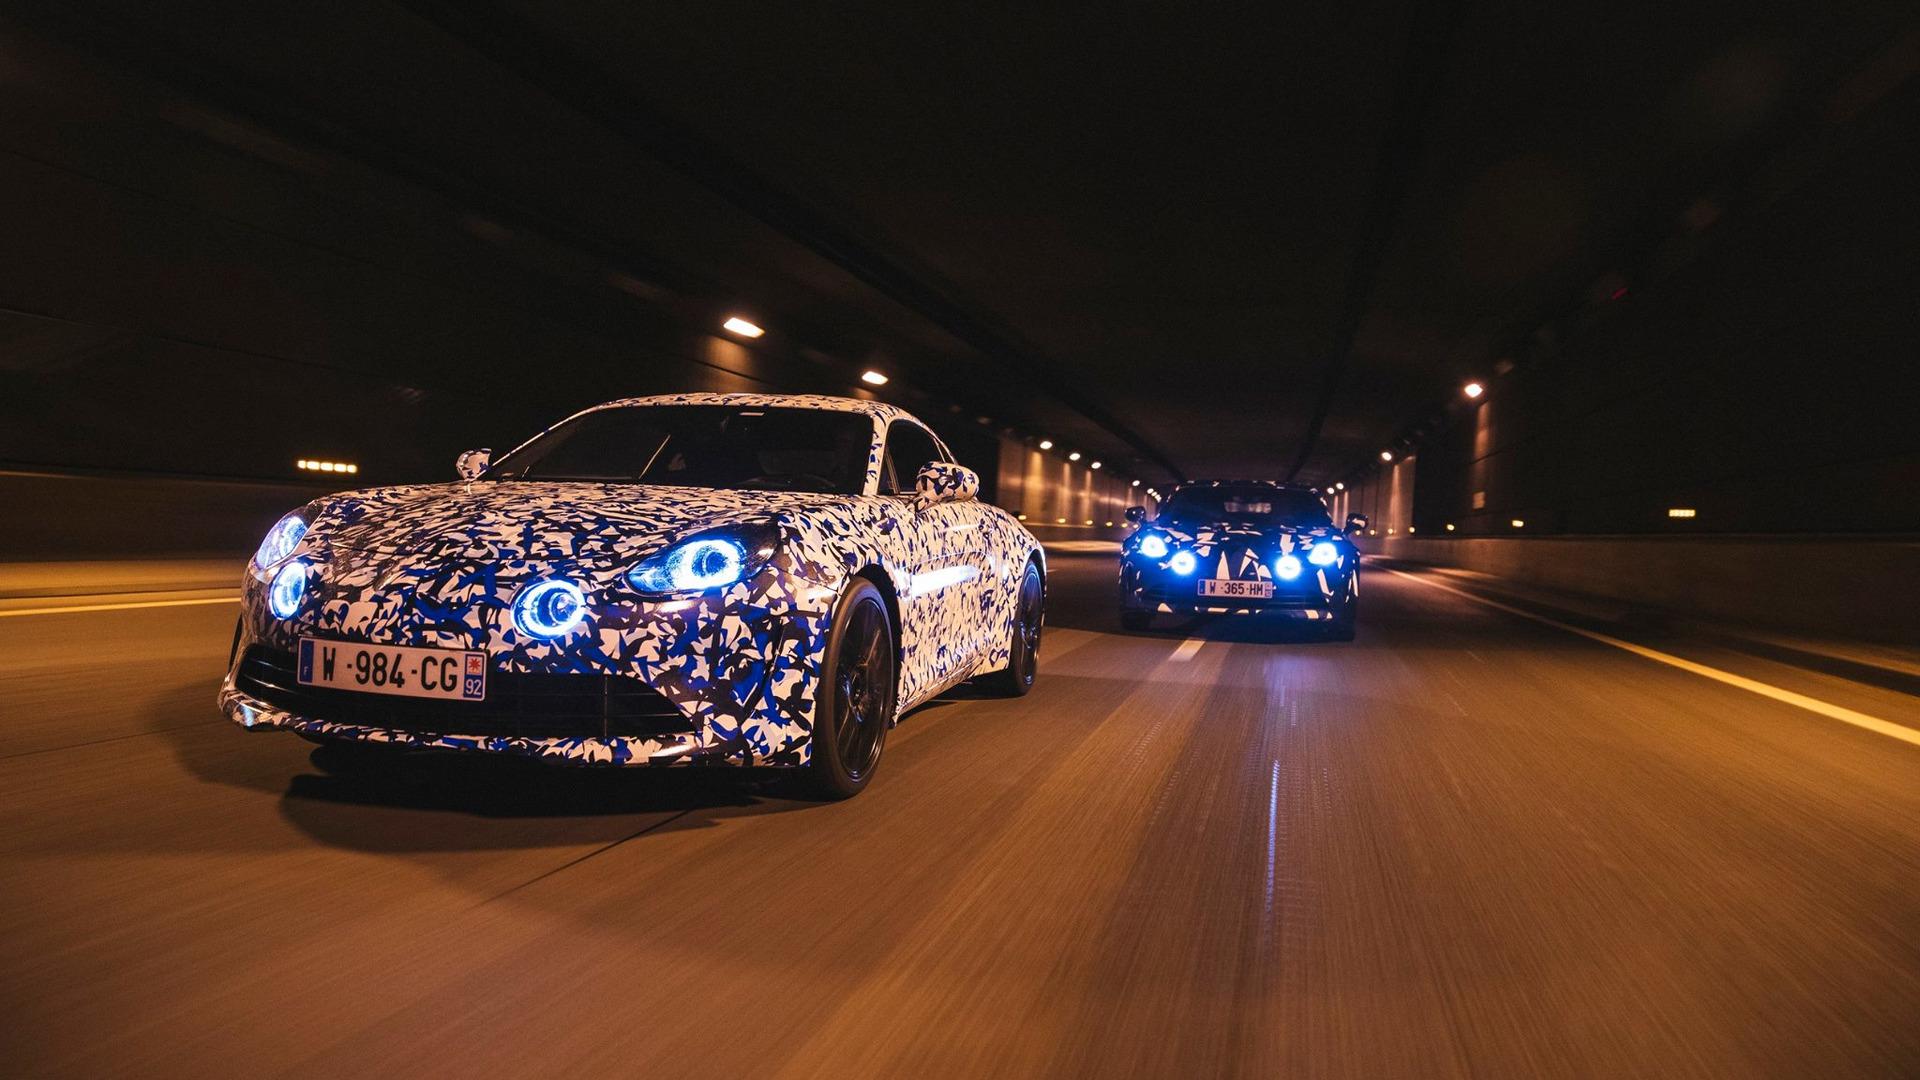 alpine-prototypes-paris-night-ride (7)